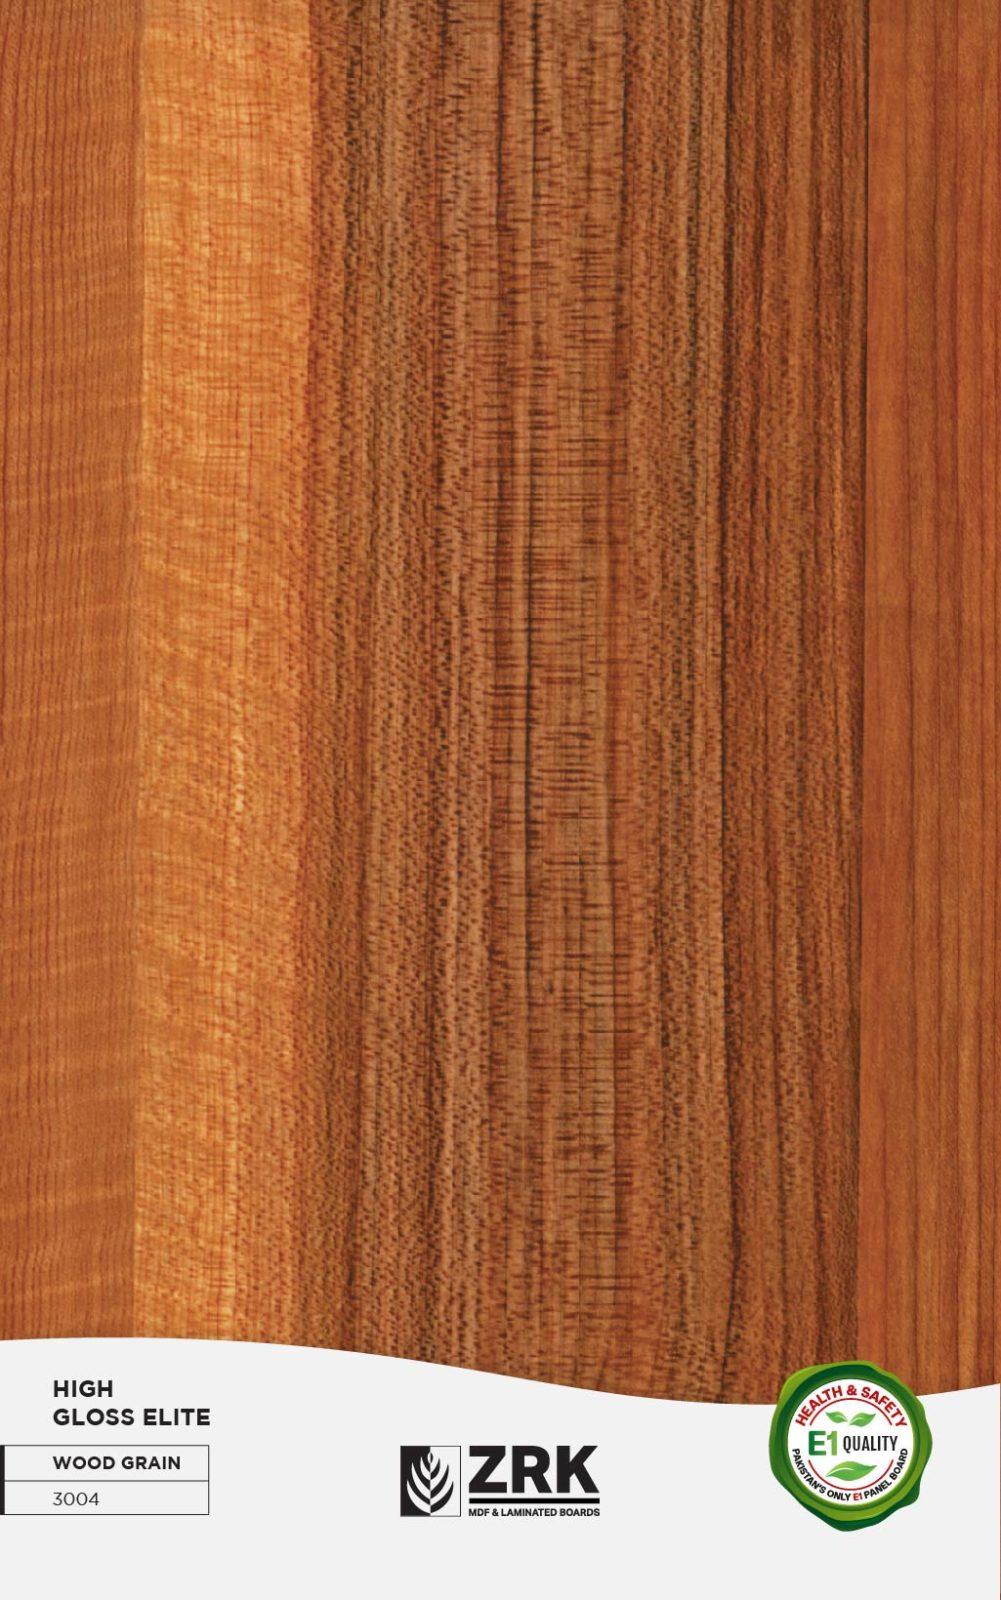 High Gloss Elite - Wood Grain - 3004